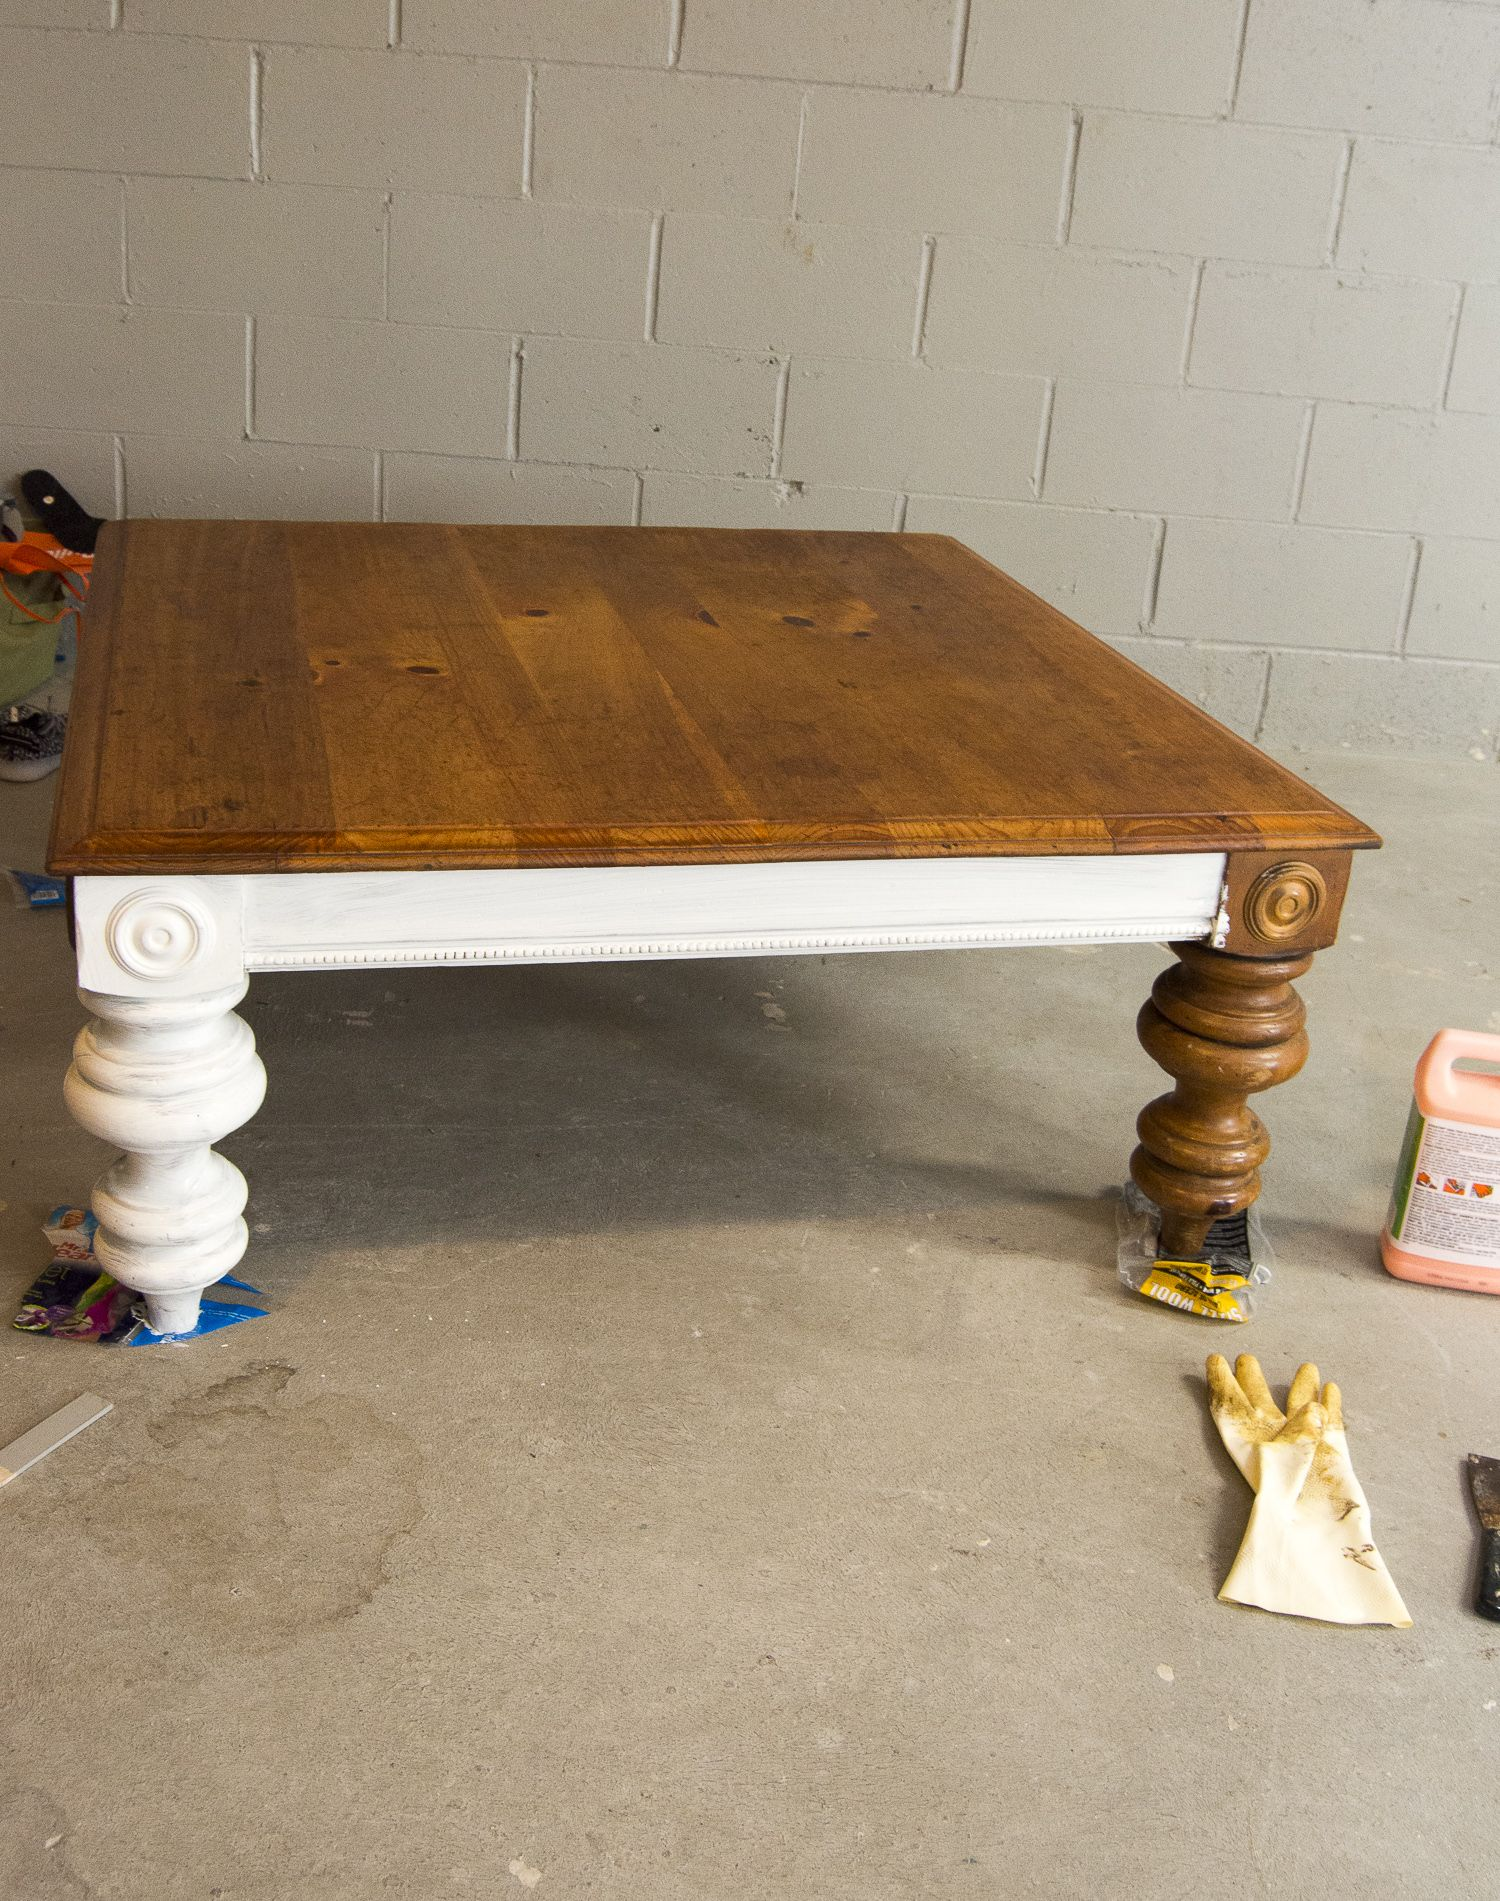 DIY Coffee Table Diy coffee table, Coffee table refinish